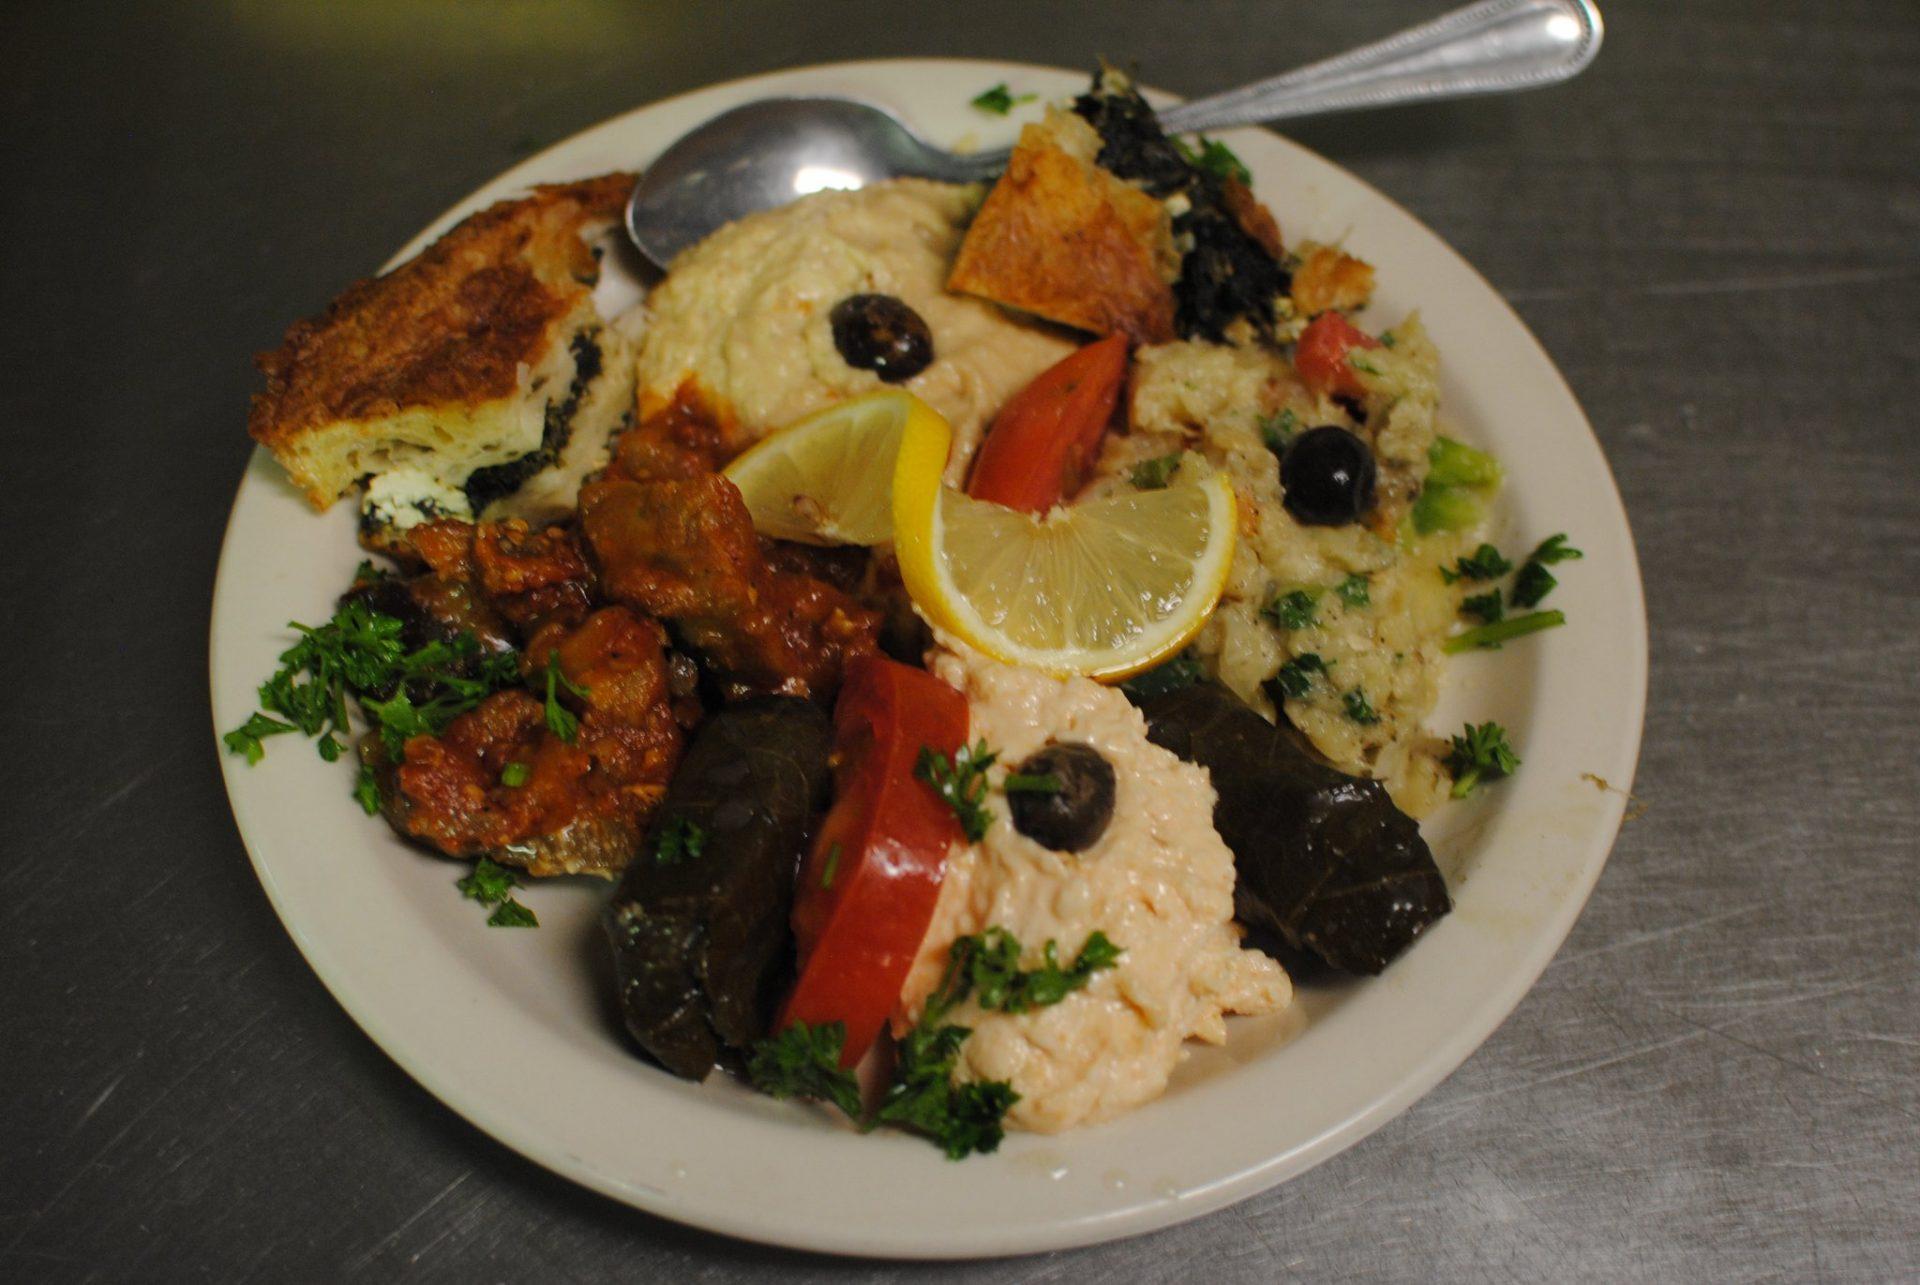 Virginia Beach Va 23451 Phone 757 417 0117 Cuisine Gluten Free Mediterranean Pizza Seafood Vegetarian Features Catering Dinner Kid Family